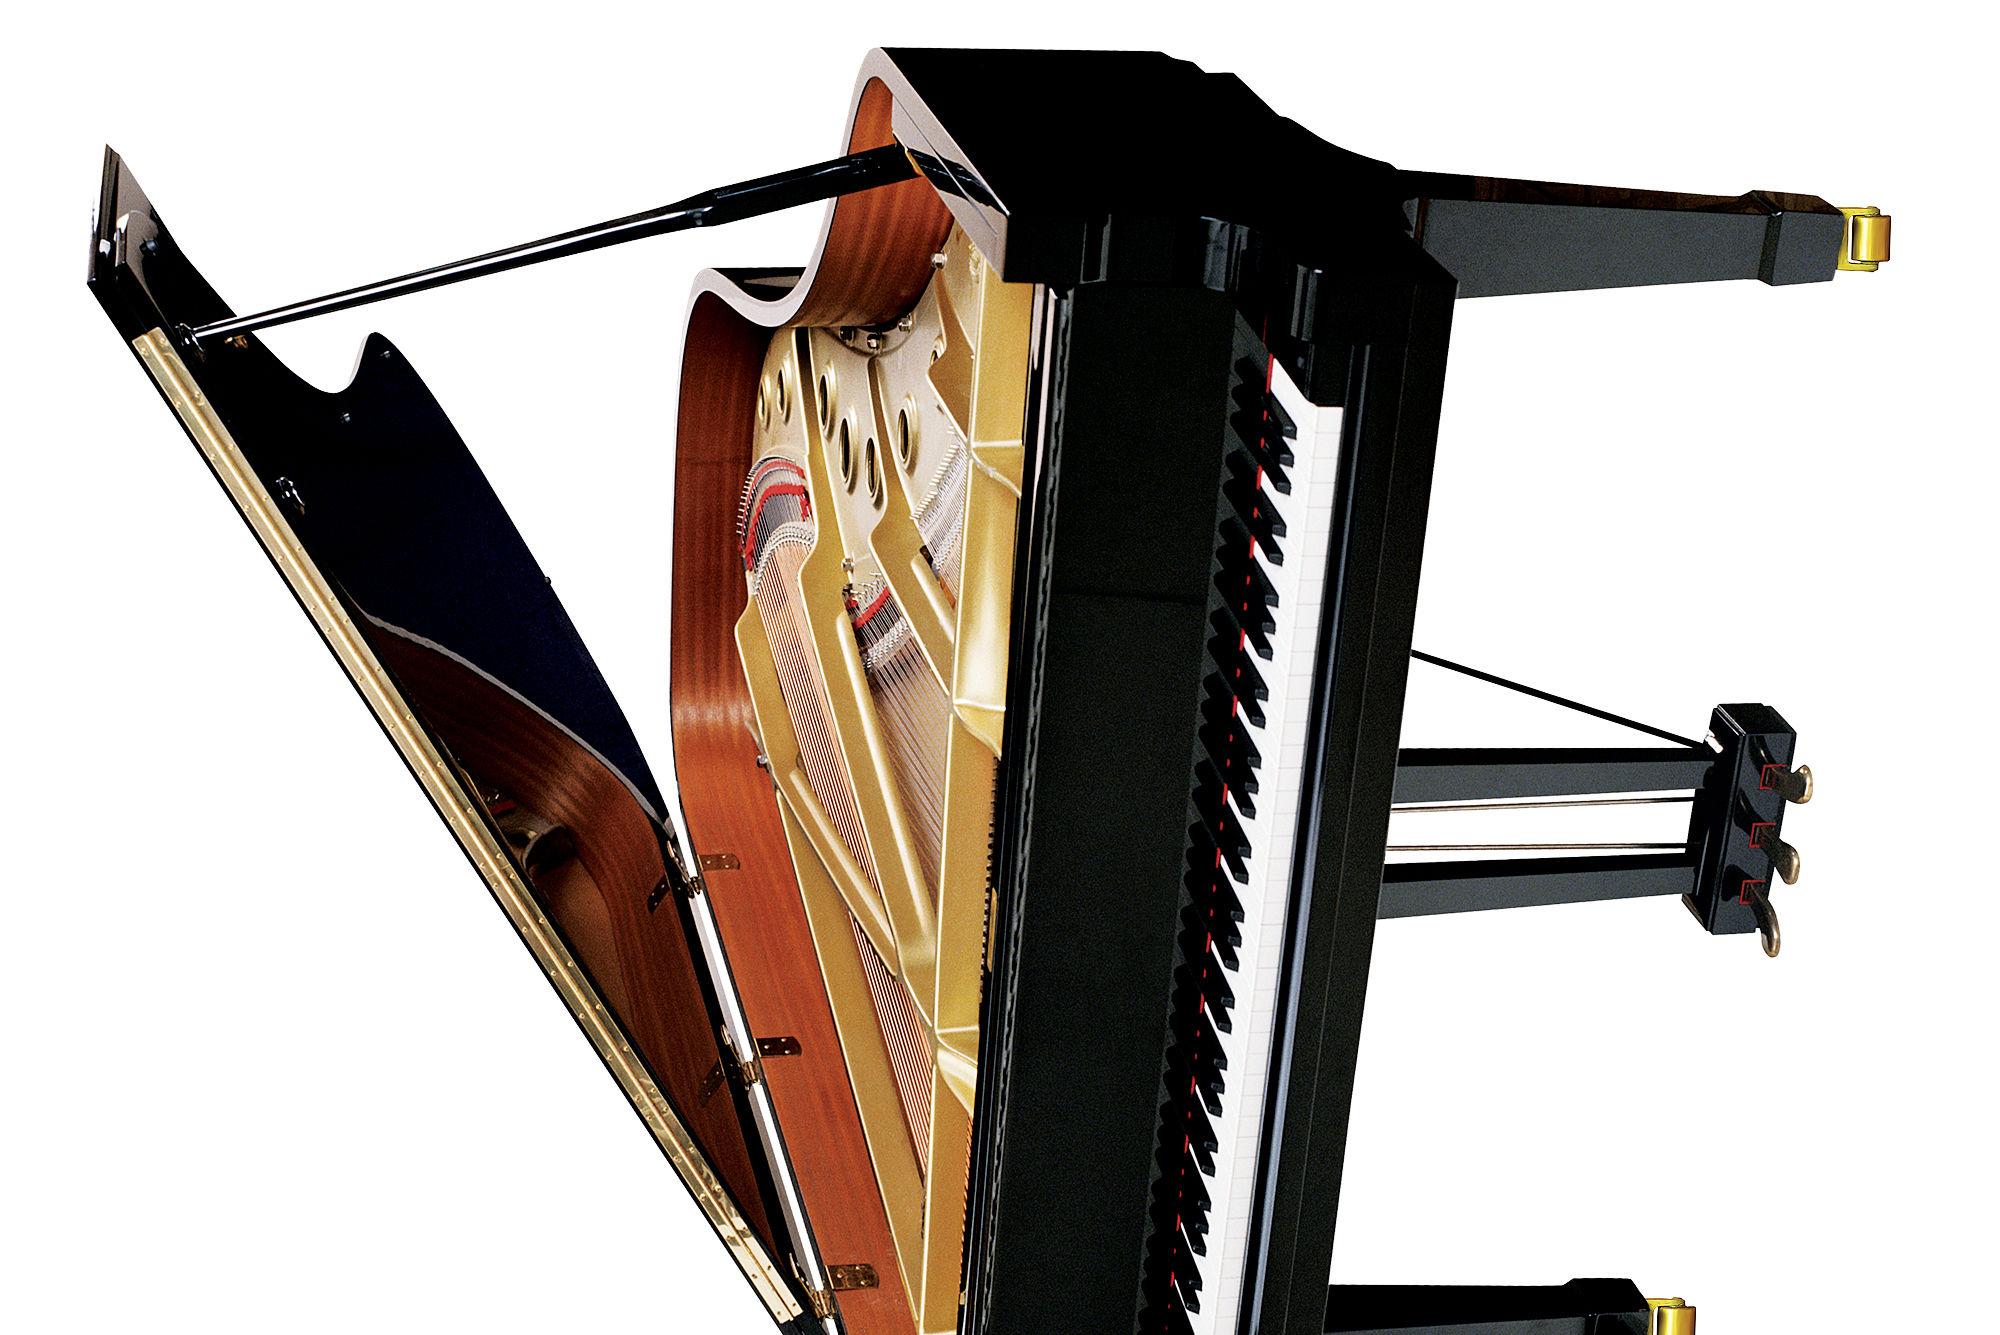 0518 finance piano zjxkft